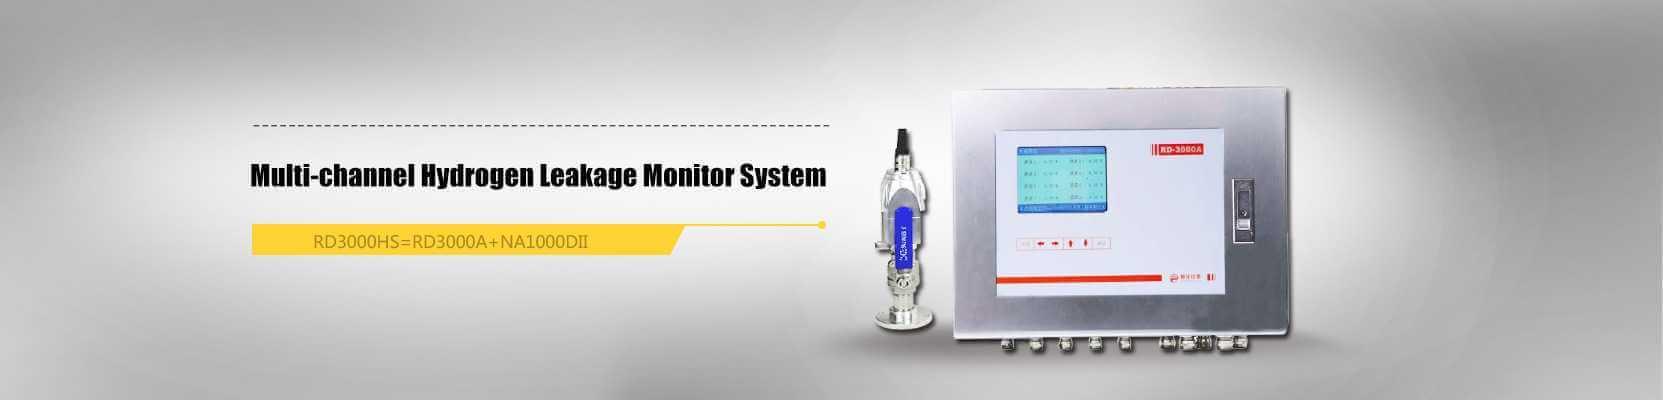 Multl-channel hydrogen leakage monitor System banner